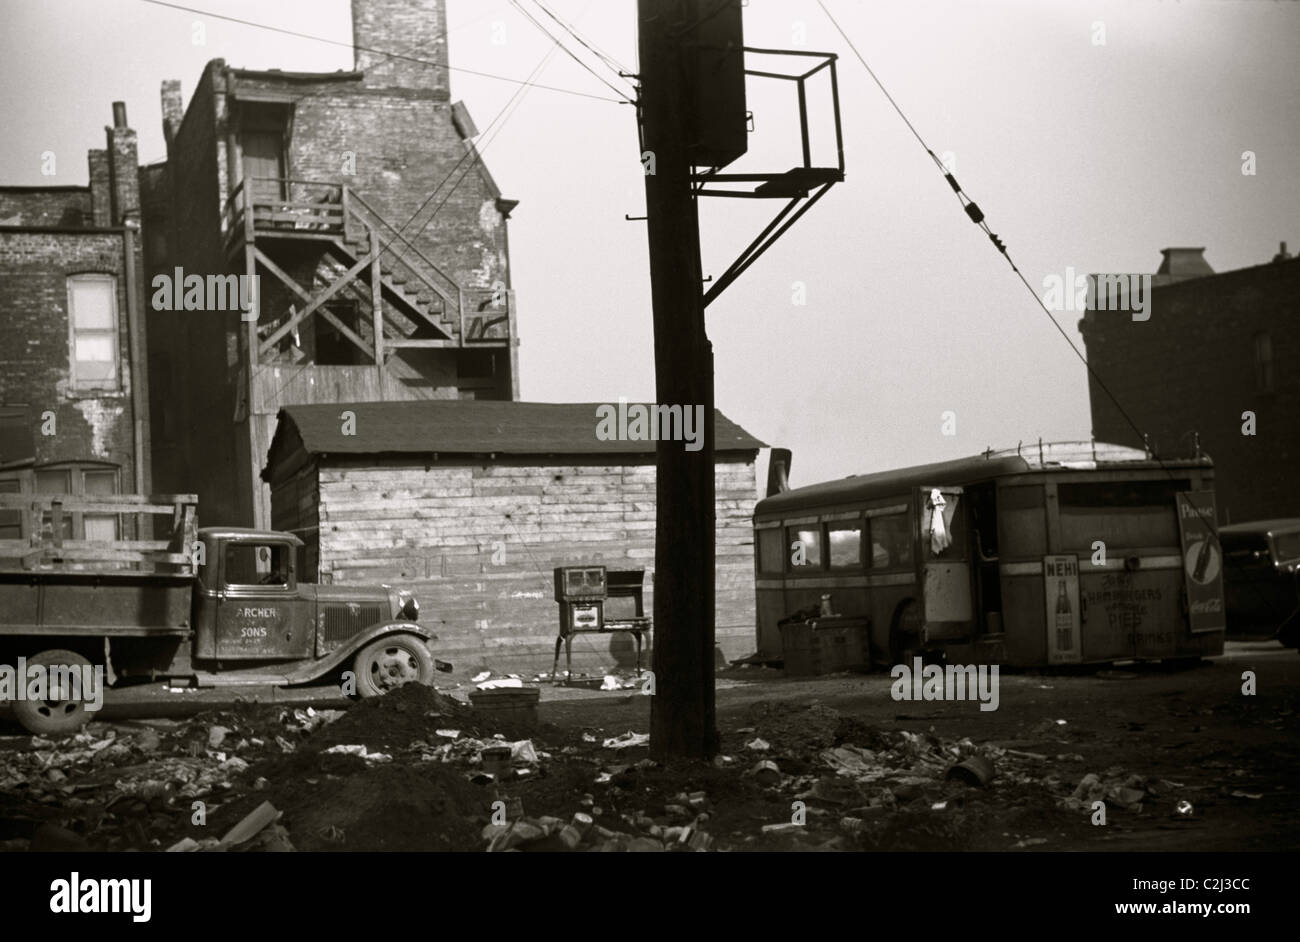 African American Scrap Yard Stock Photo